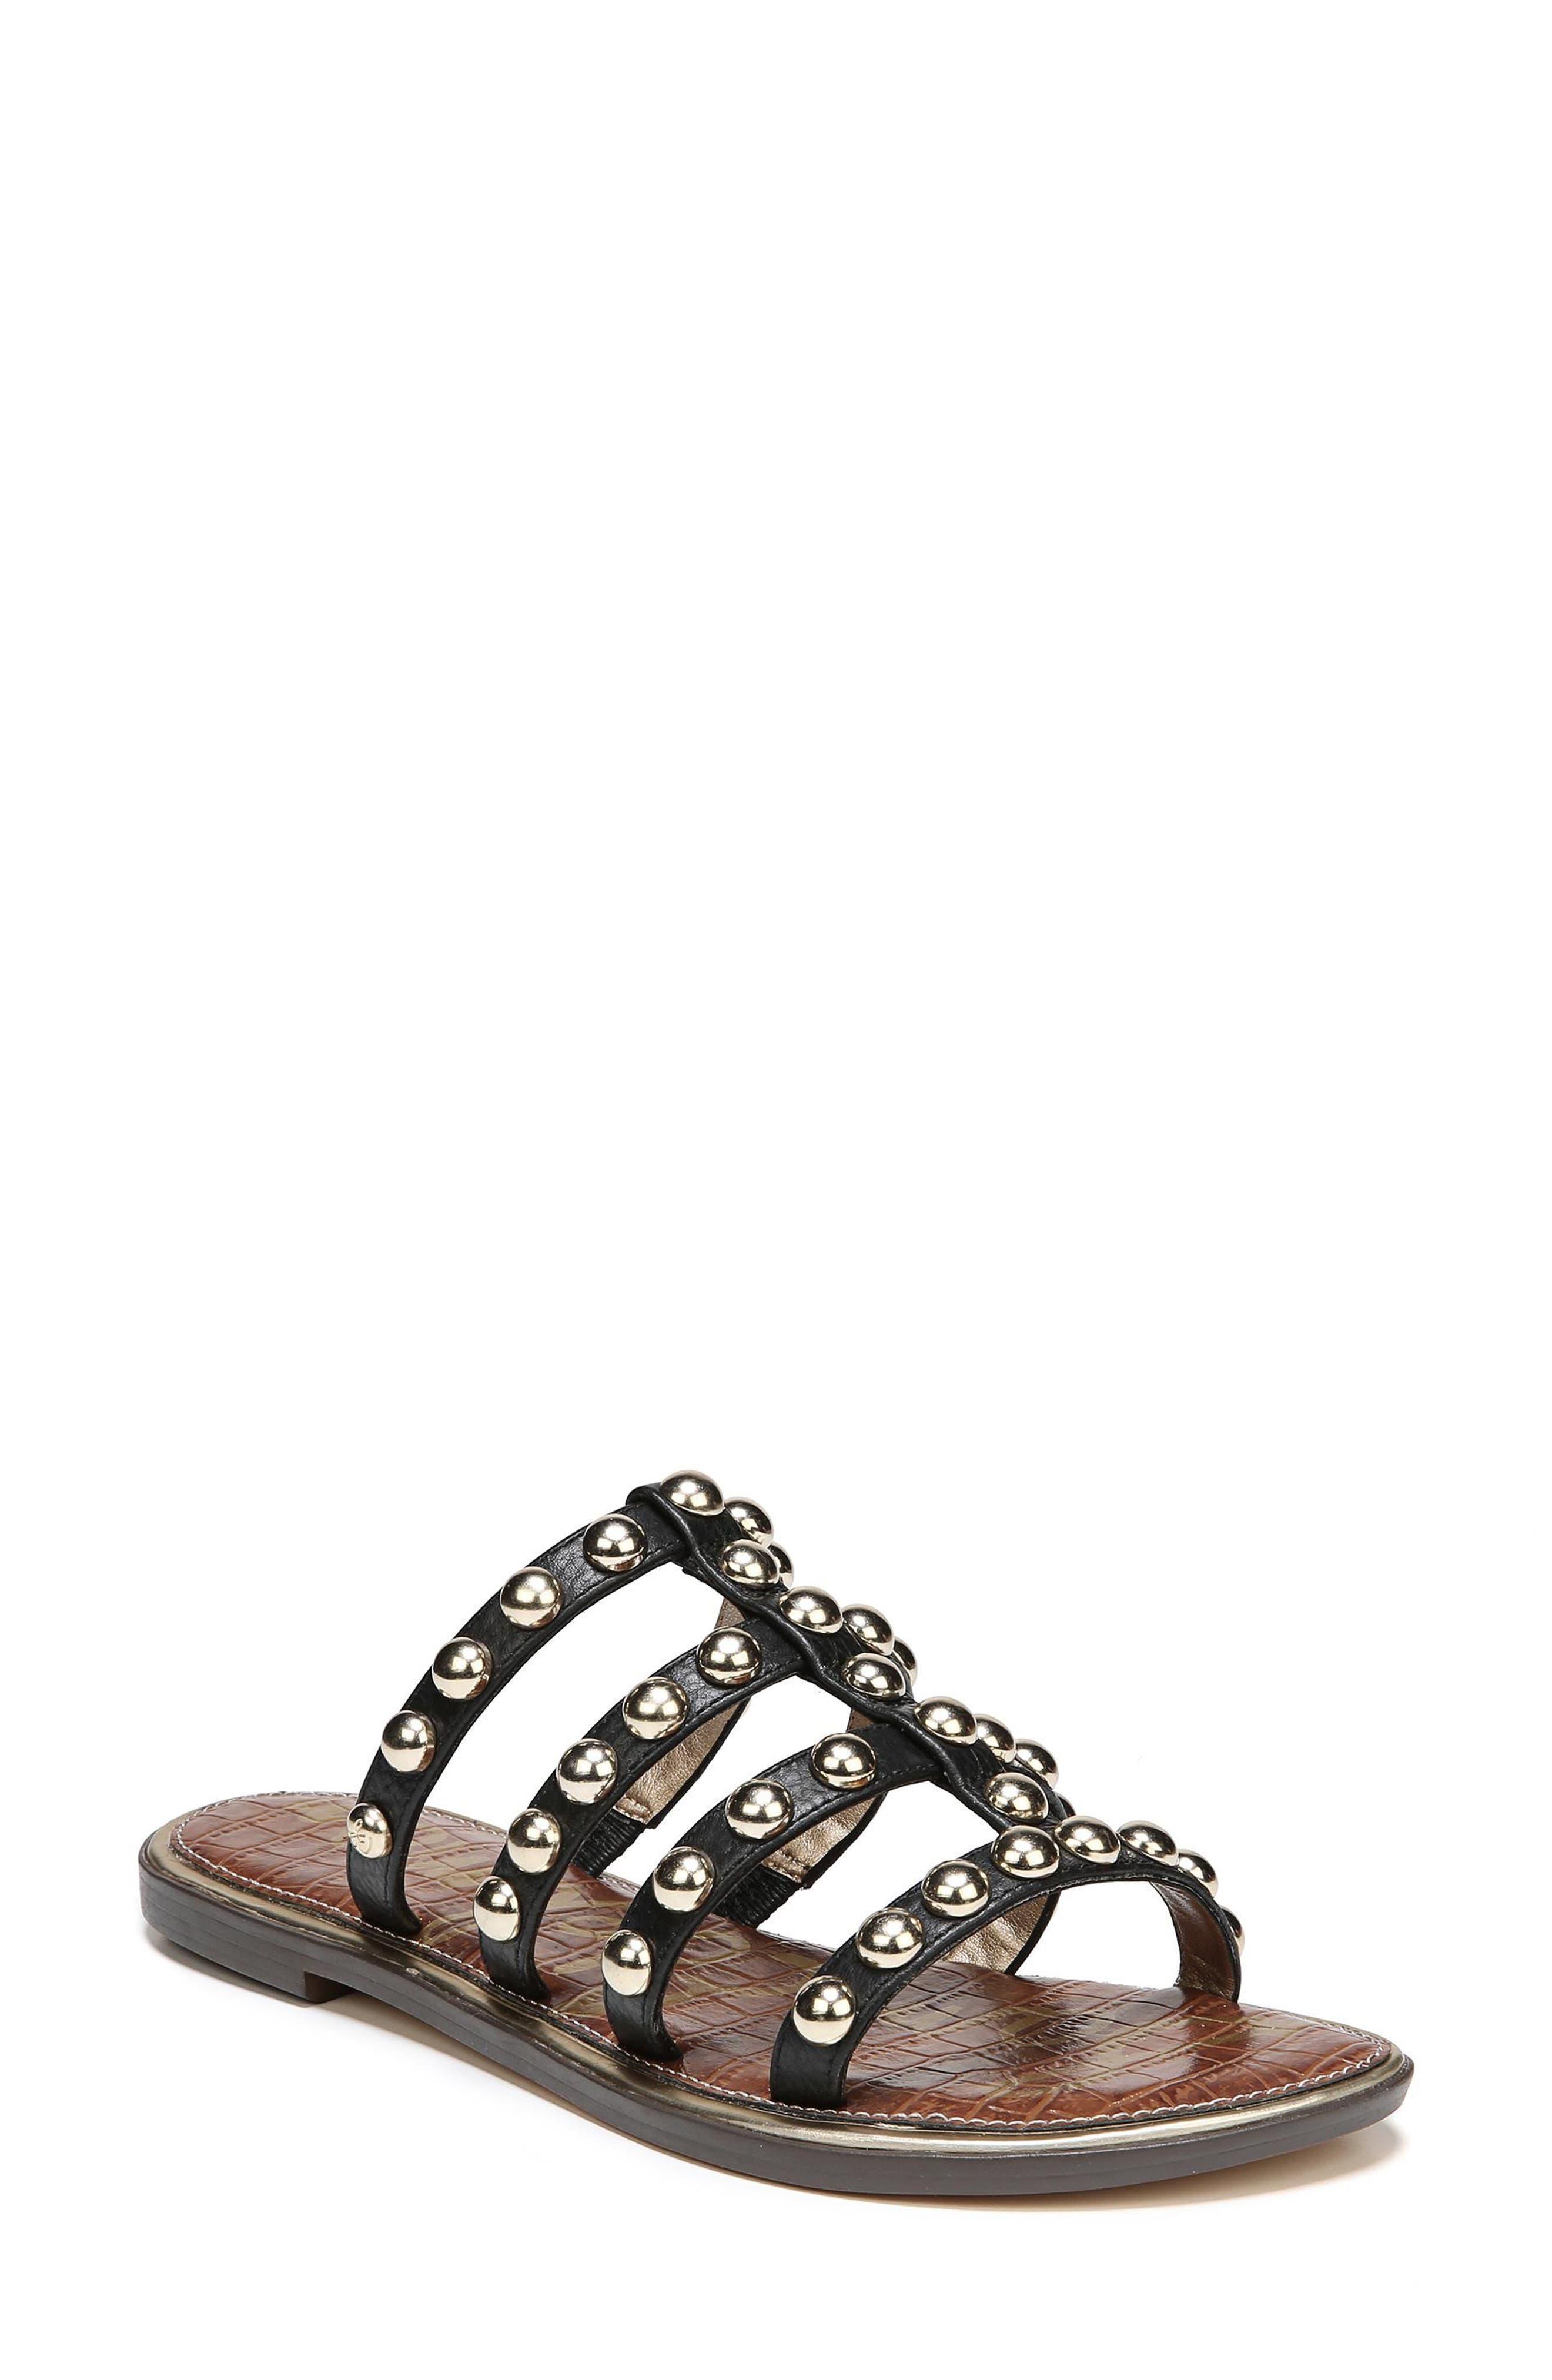 Glenn Studded Slide Sandal,                         Main,                         color, Black Leather